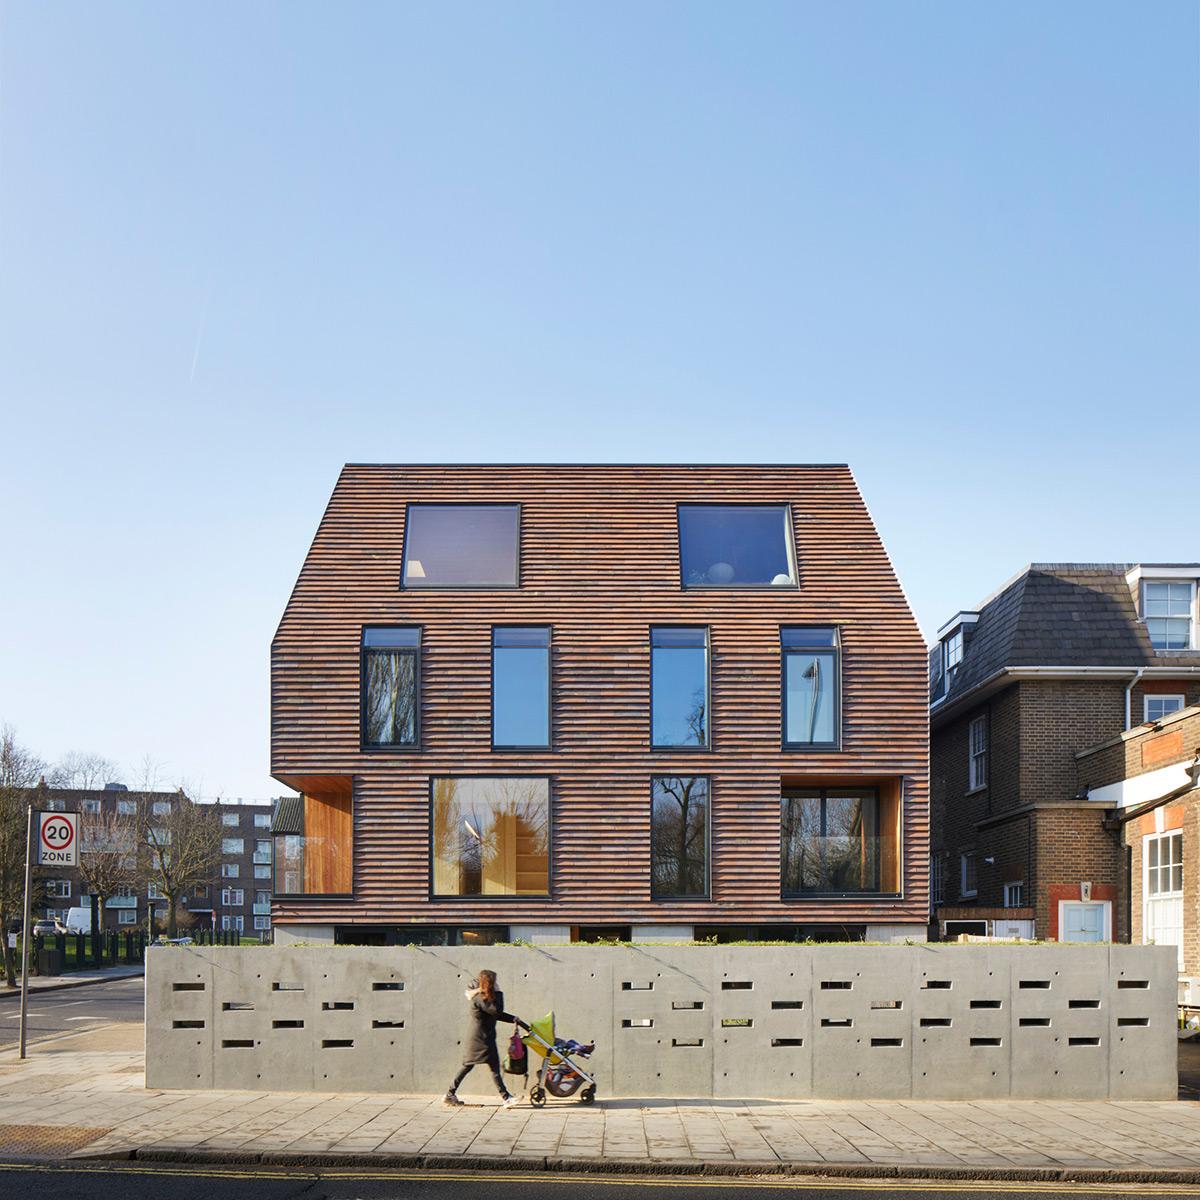 The-Rye-Apartments-Tikari-Works-Jack-Hobhouse-01